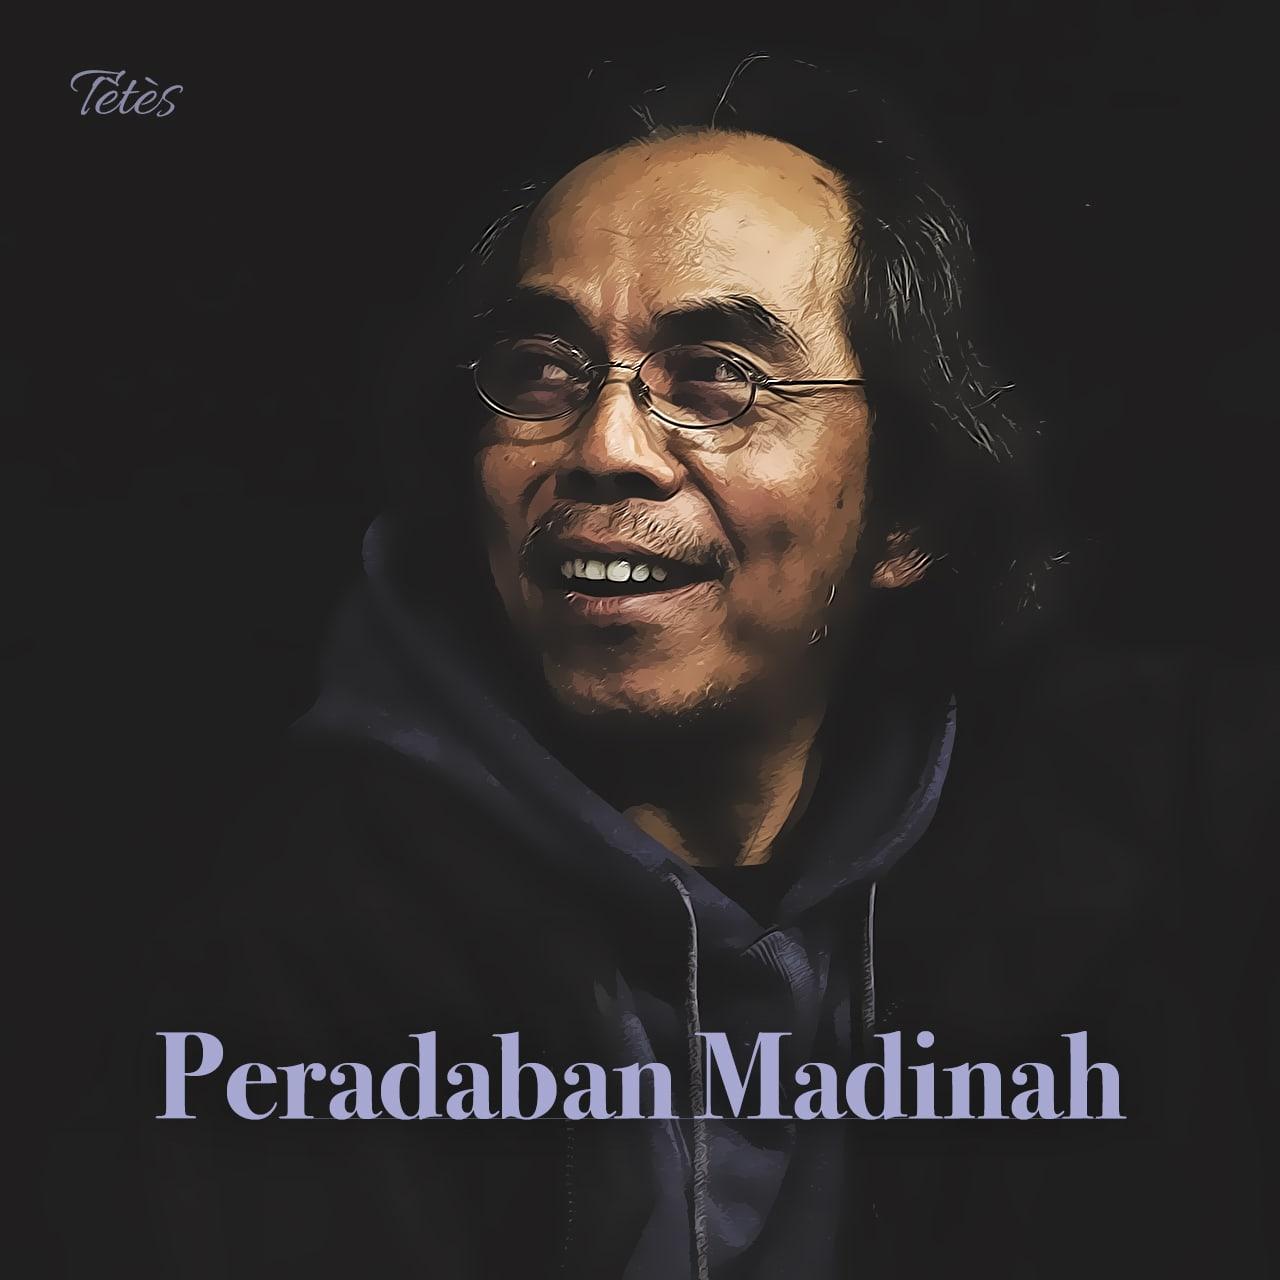 Peradaban Madinah